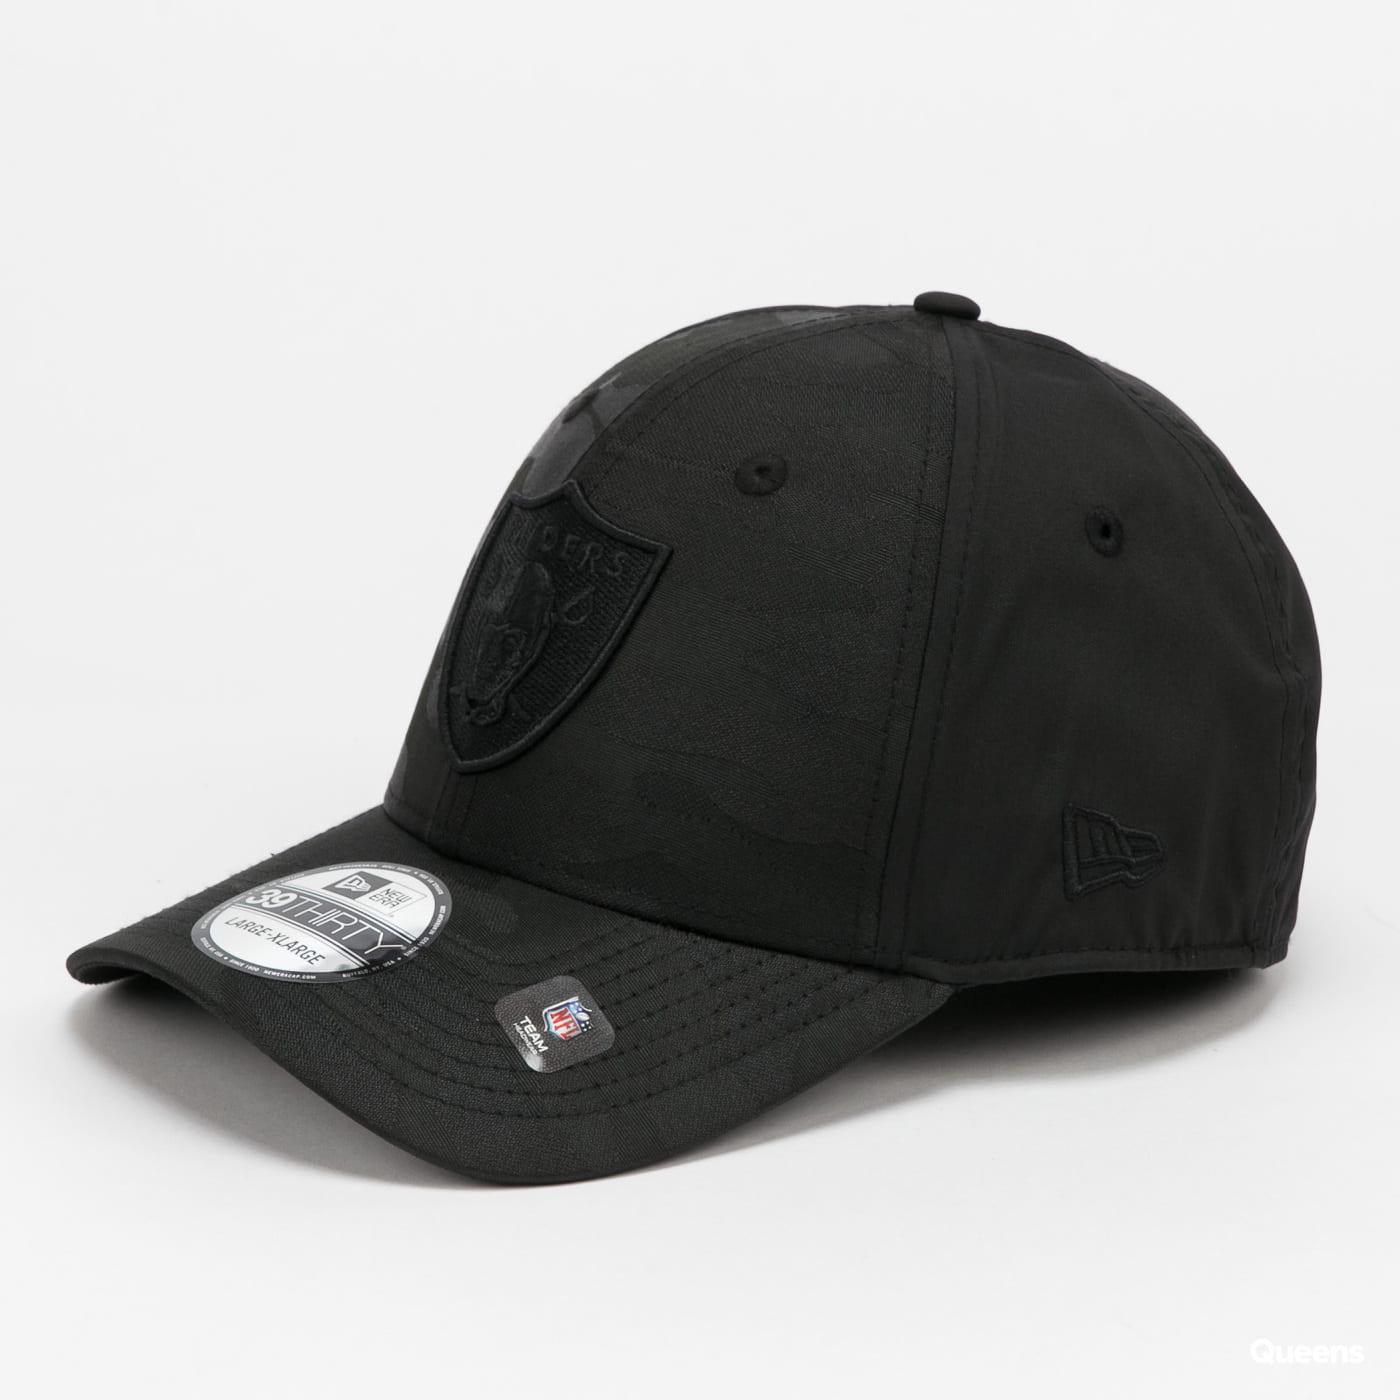 New Era 3930 NFL Black Camo Raiders gray / beige / pink / black